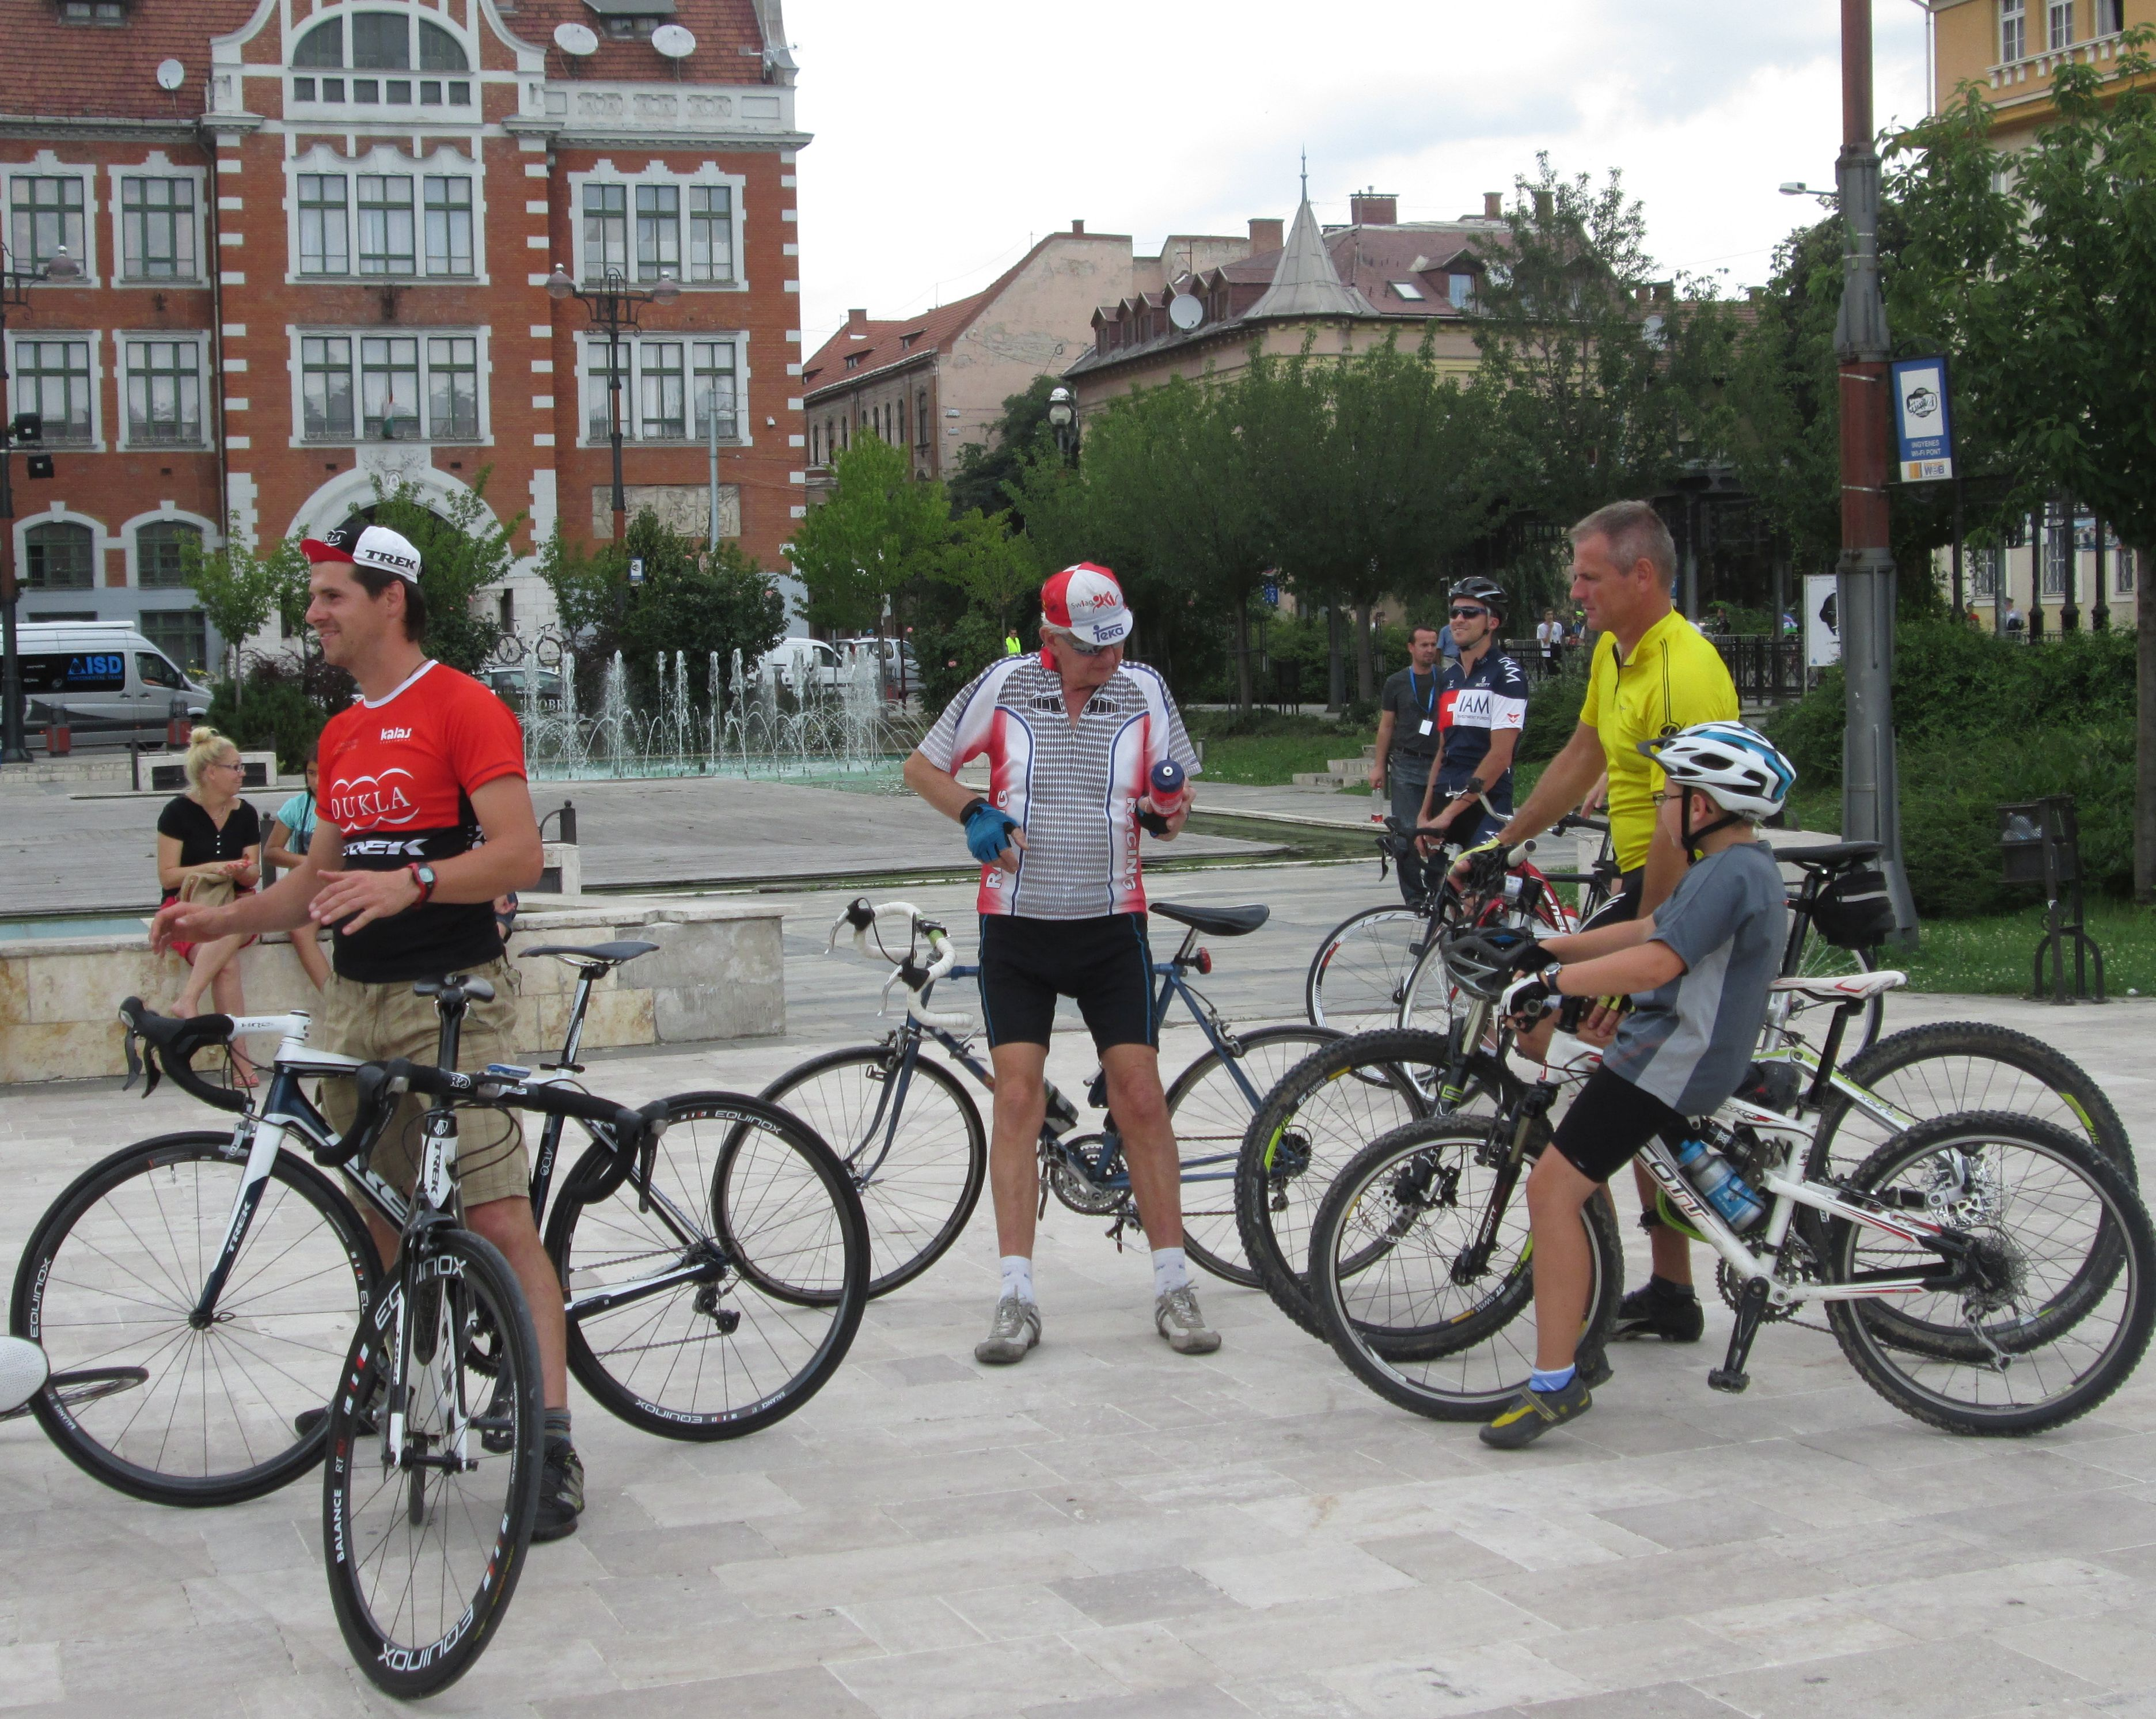 biciklis_hosok_tere_ks_6_cut.jpg